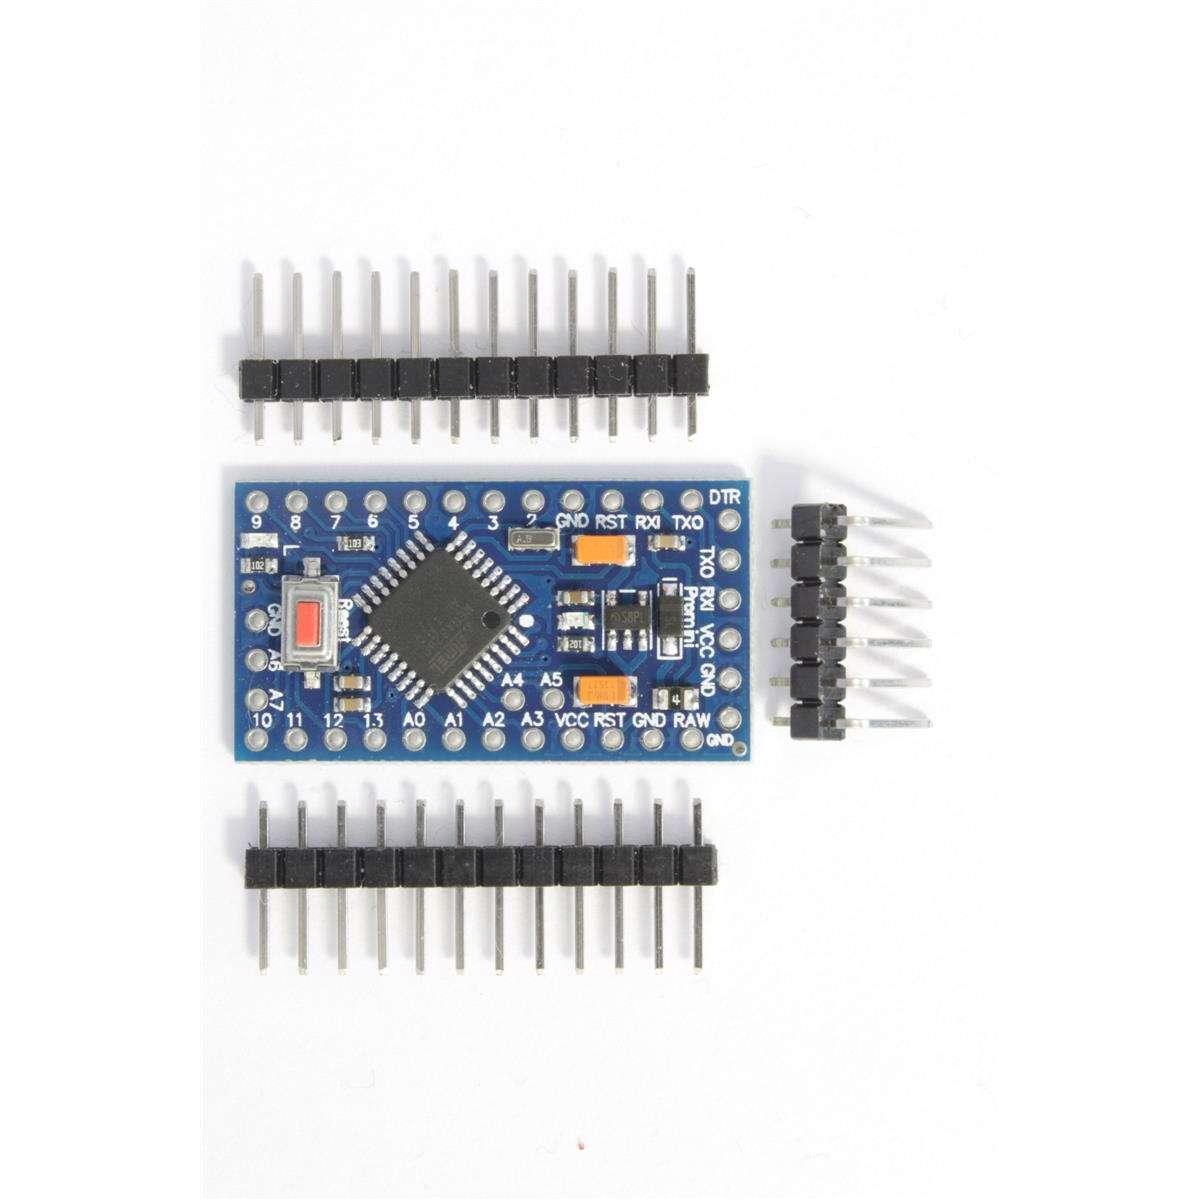 Arduino pro mini atmega v mhz board